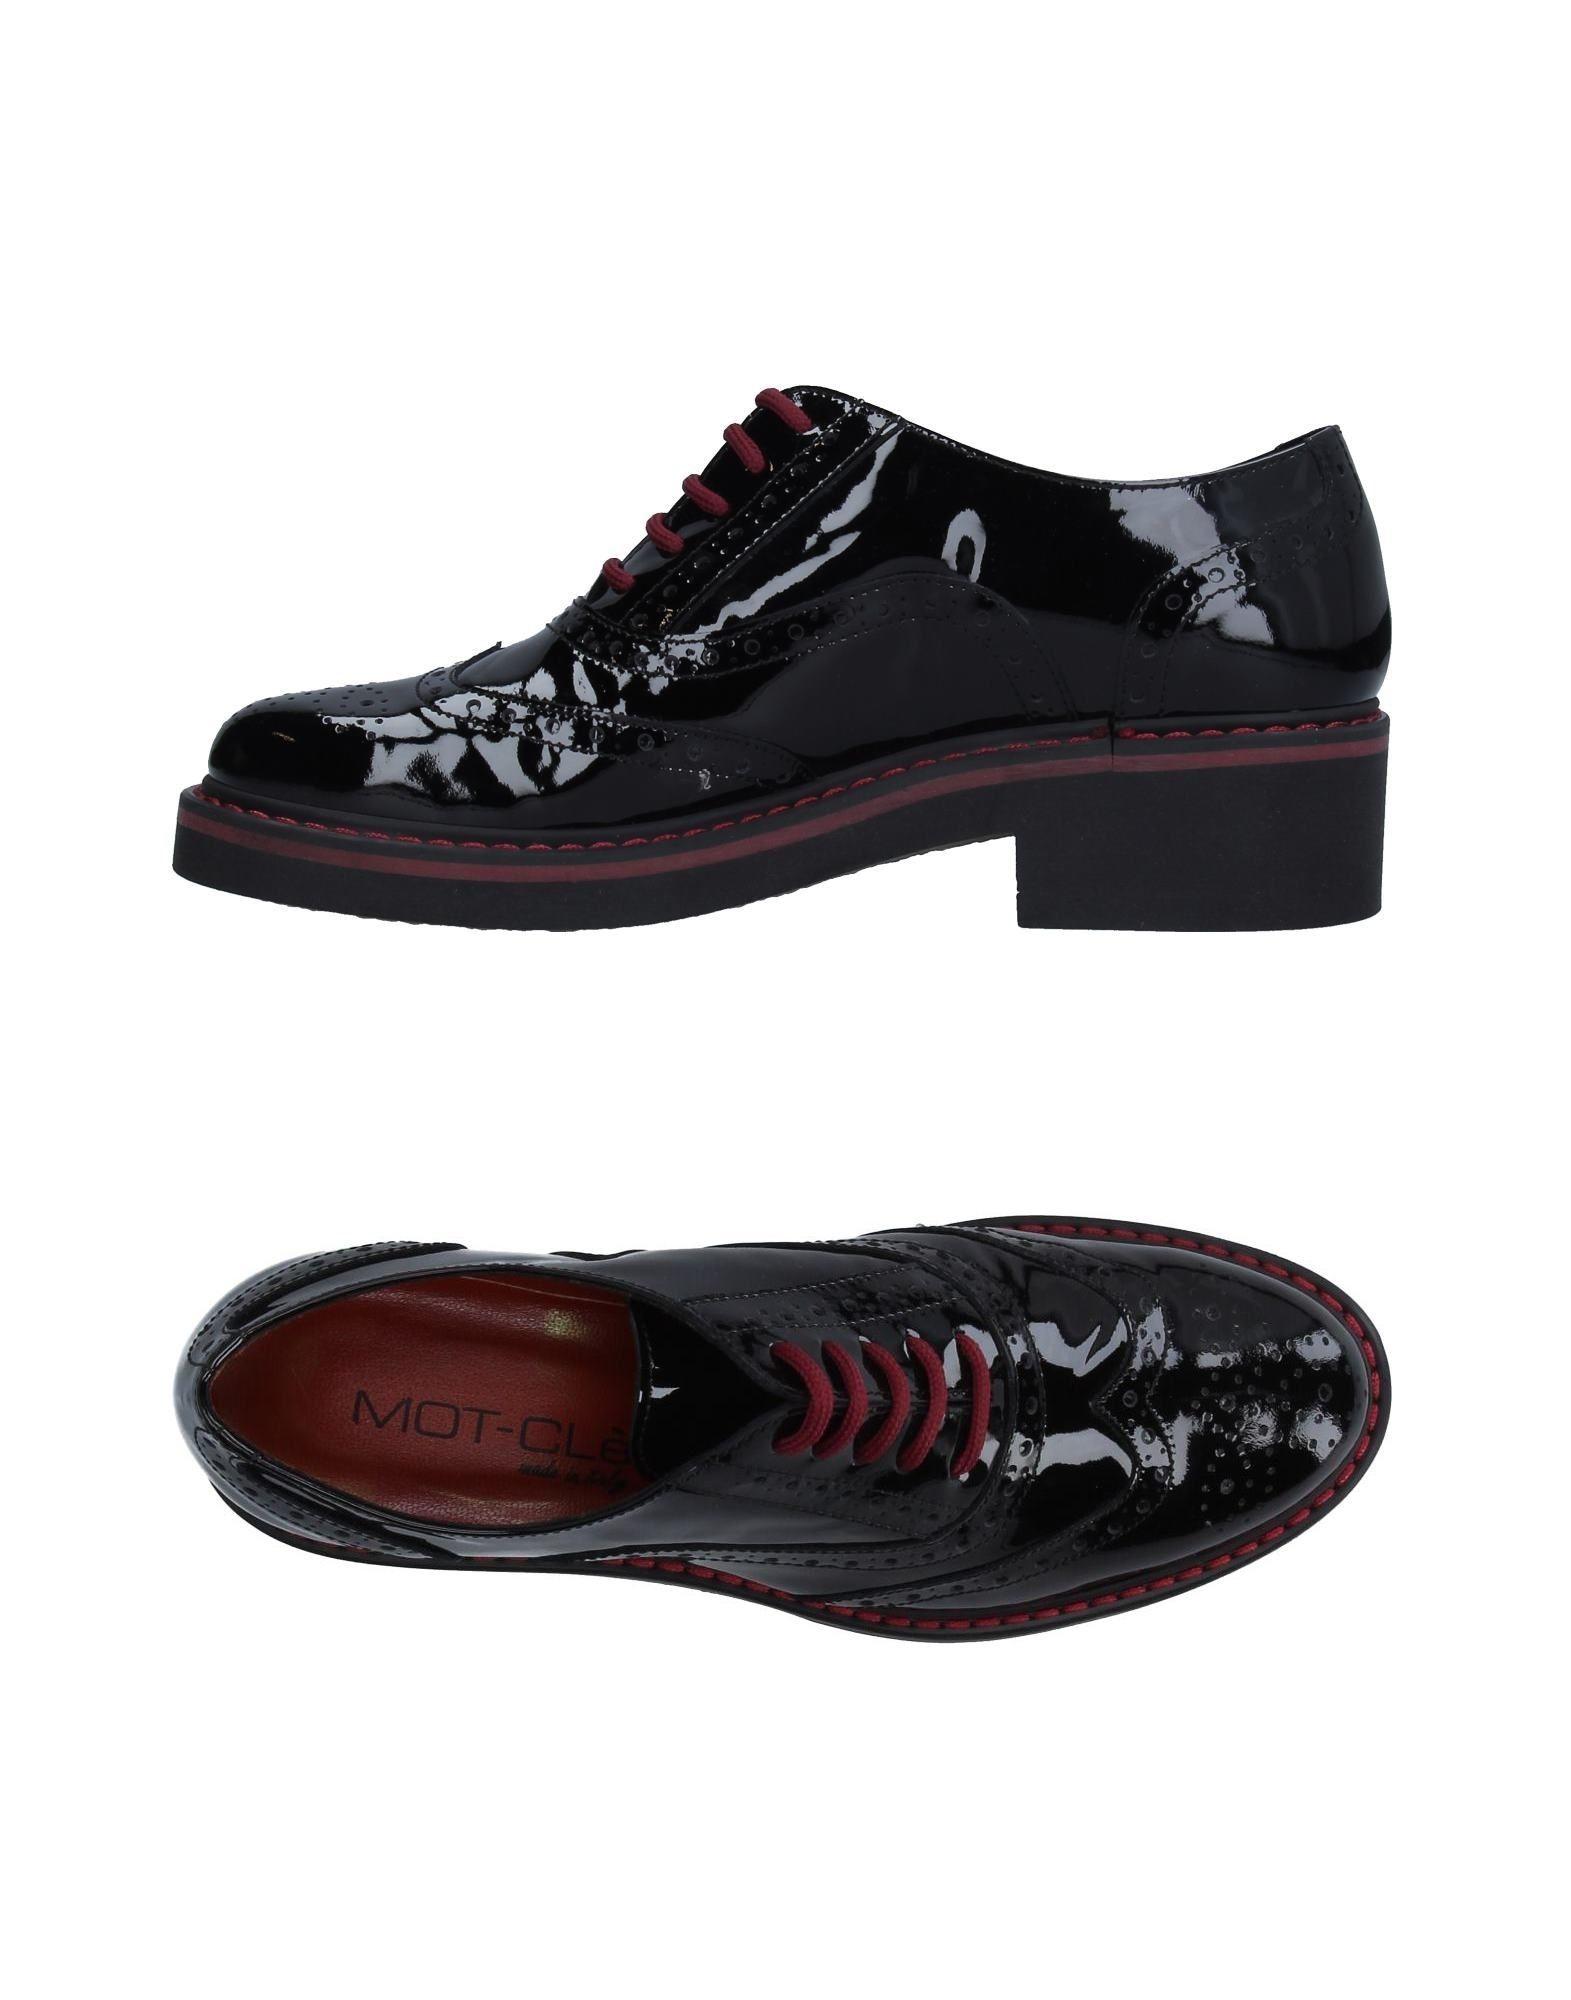 Фотография MOT-CLè Обувь на шнурках